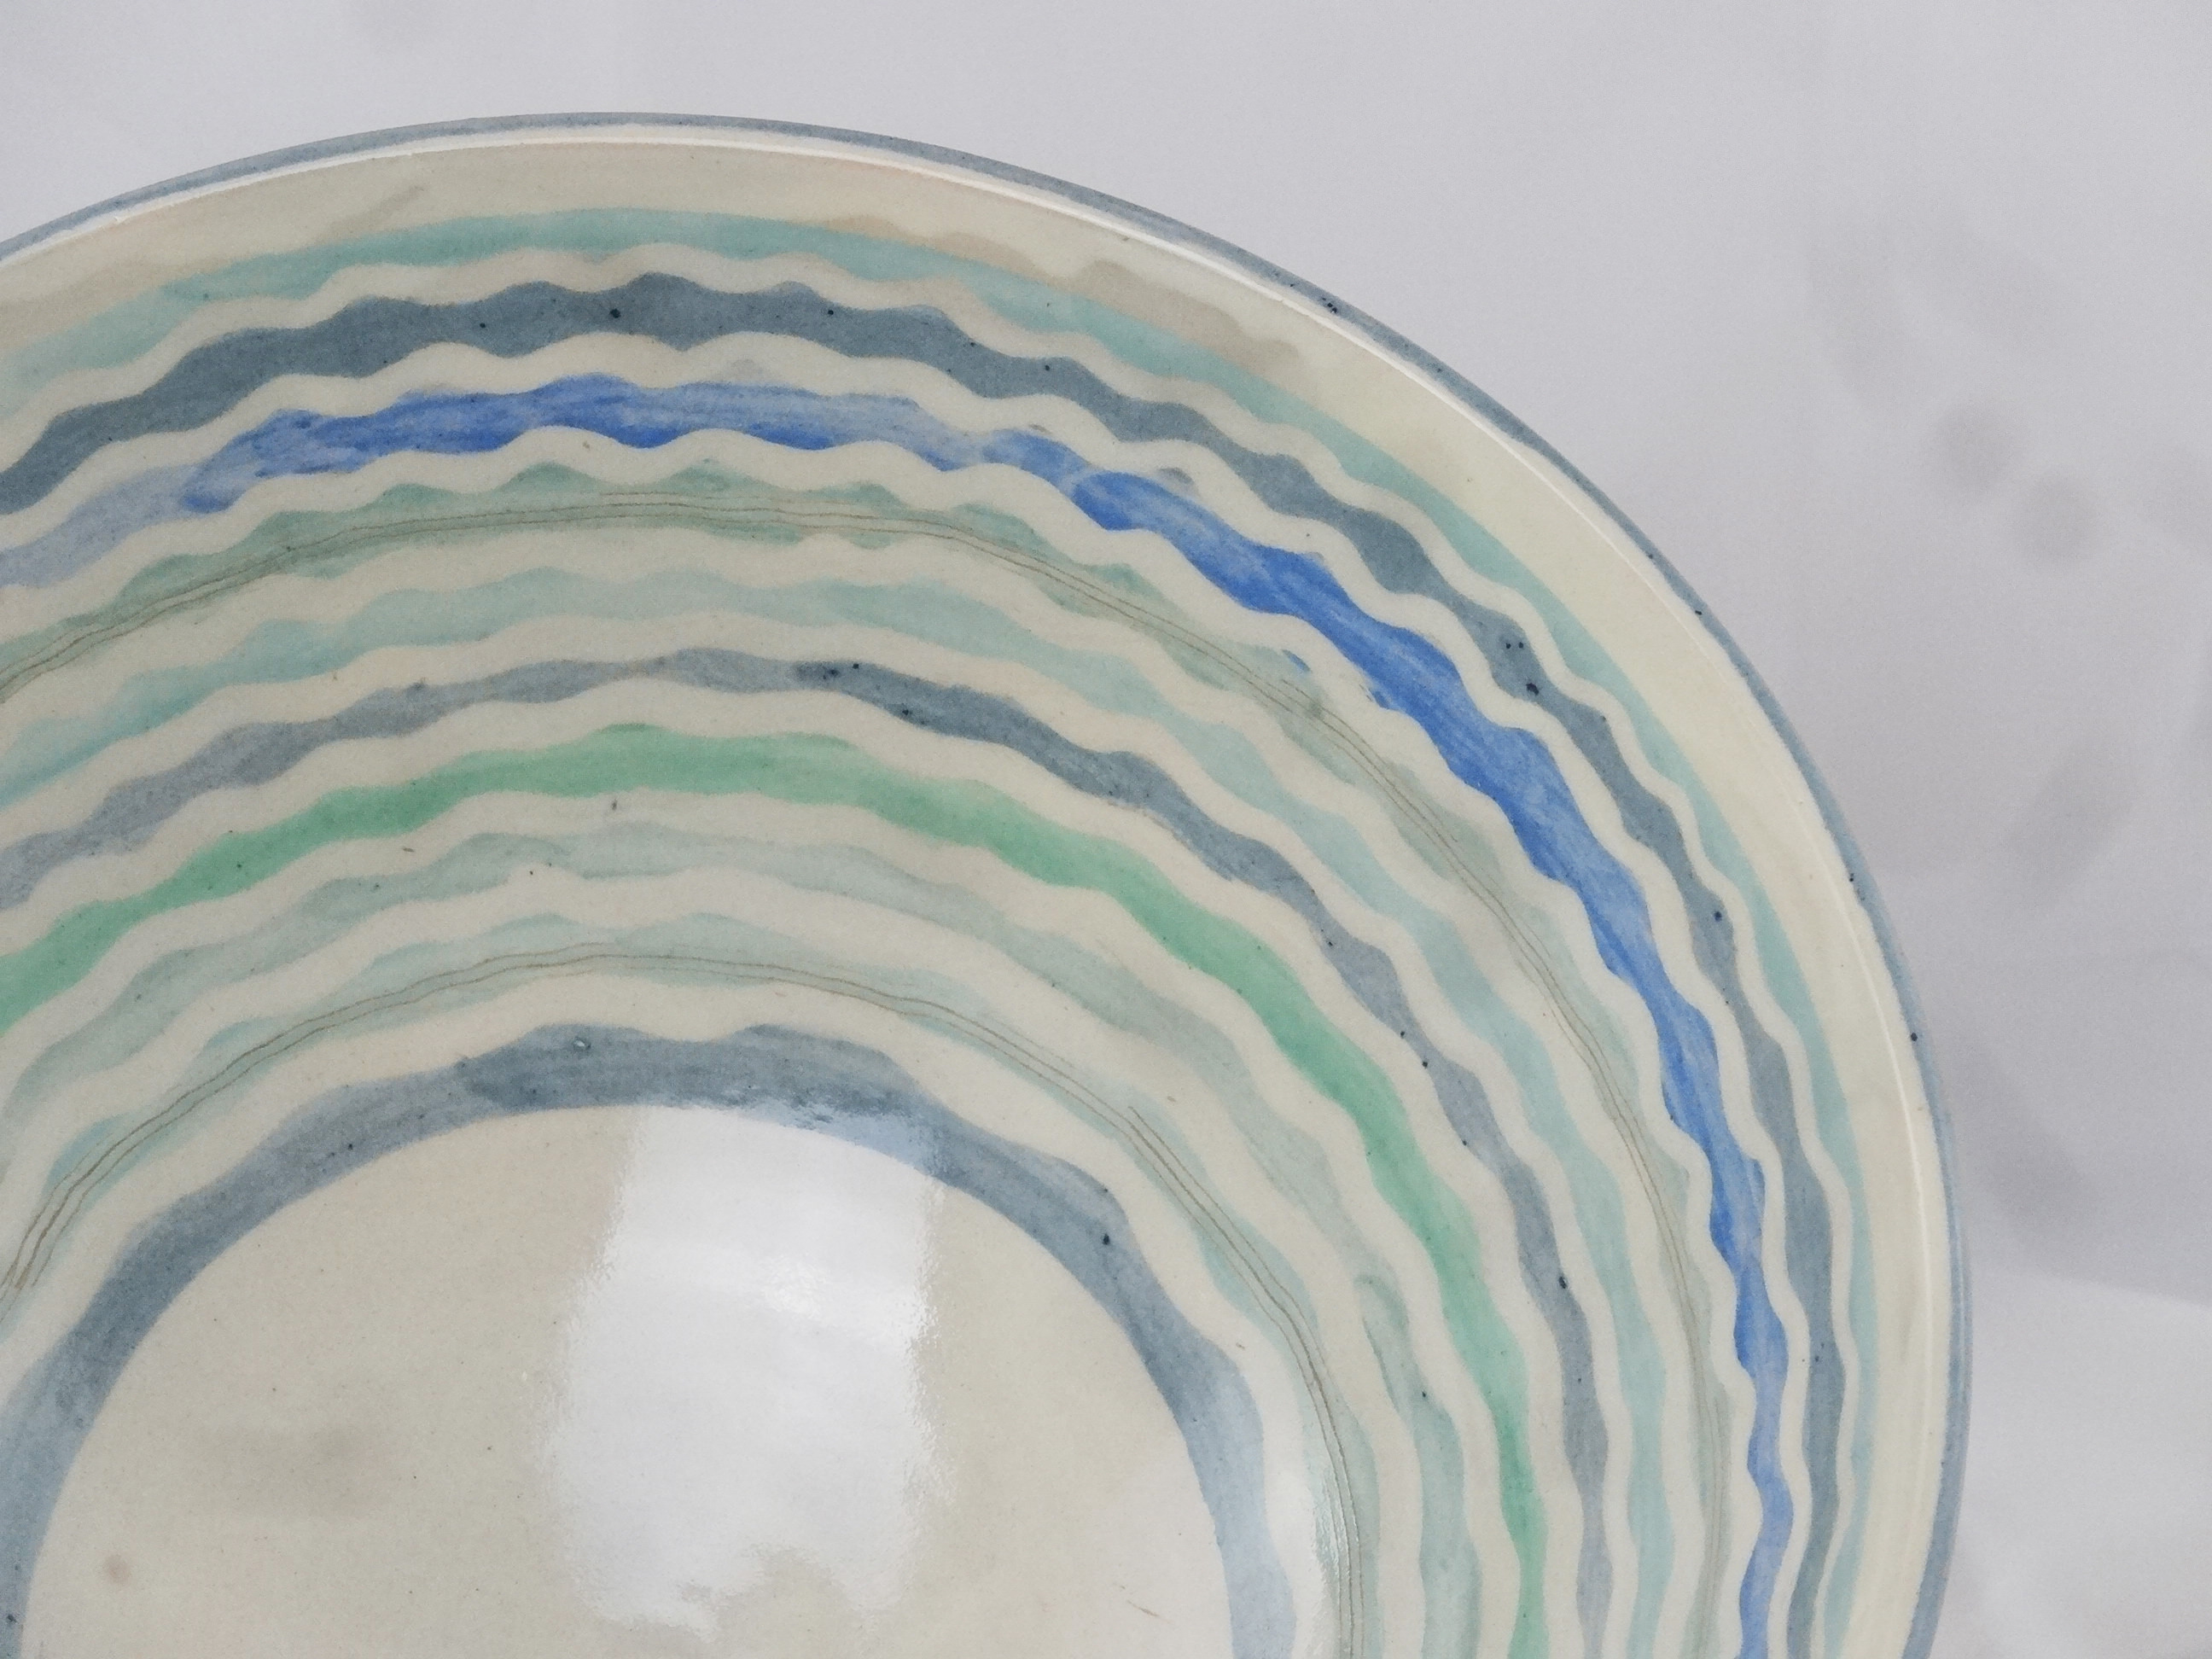 Dekor Welle Blautöne